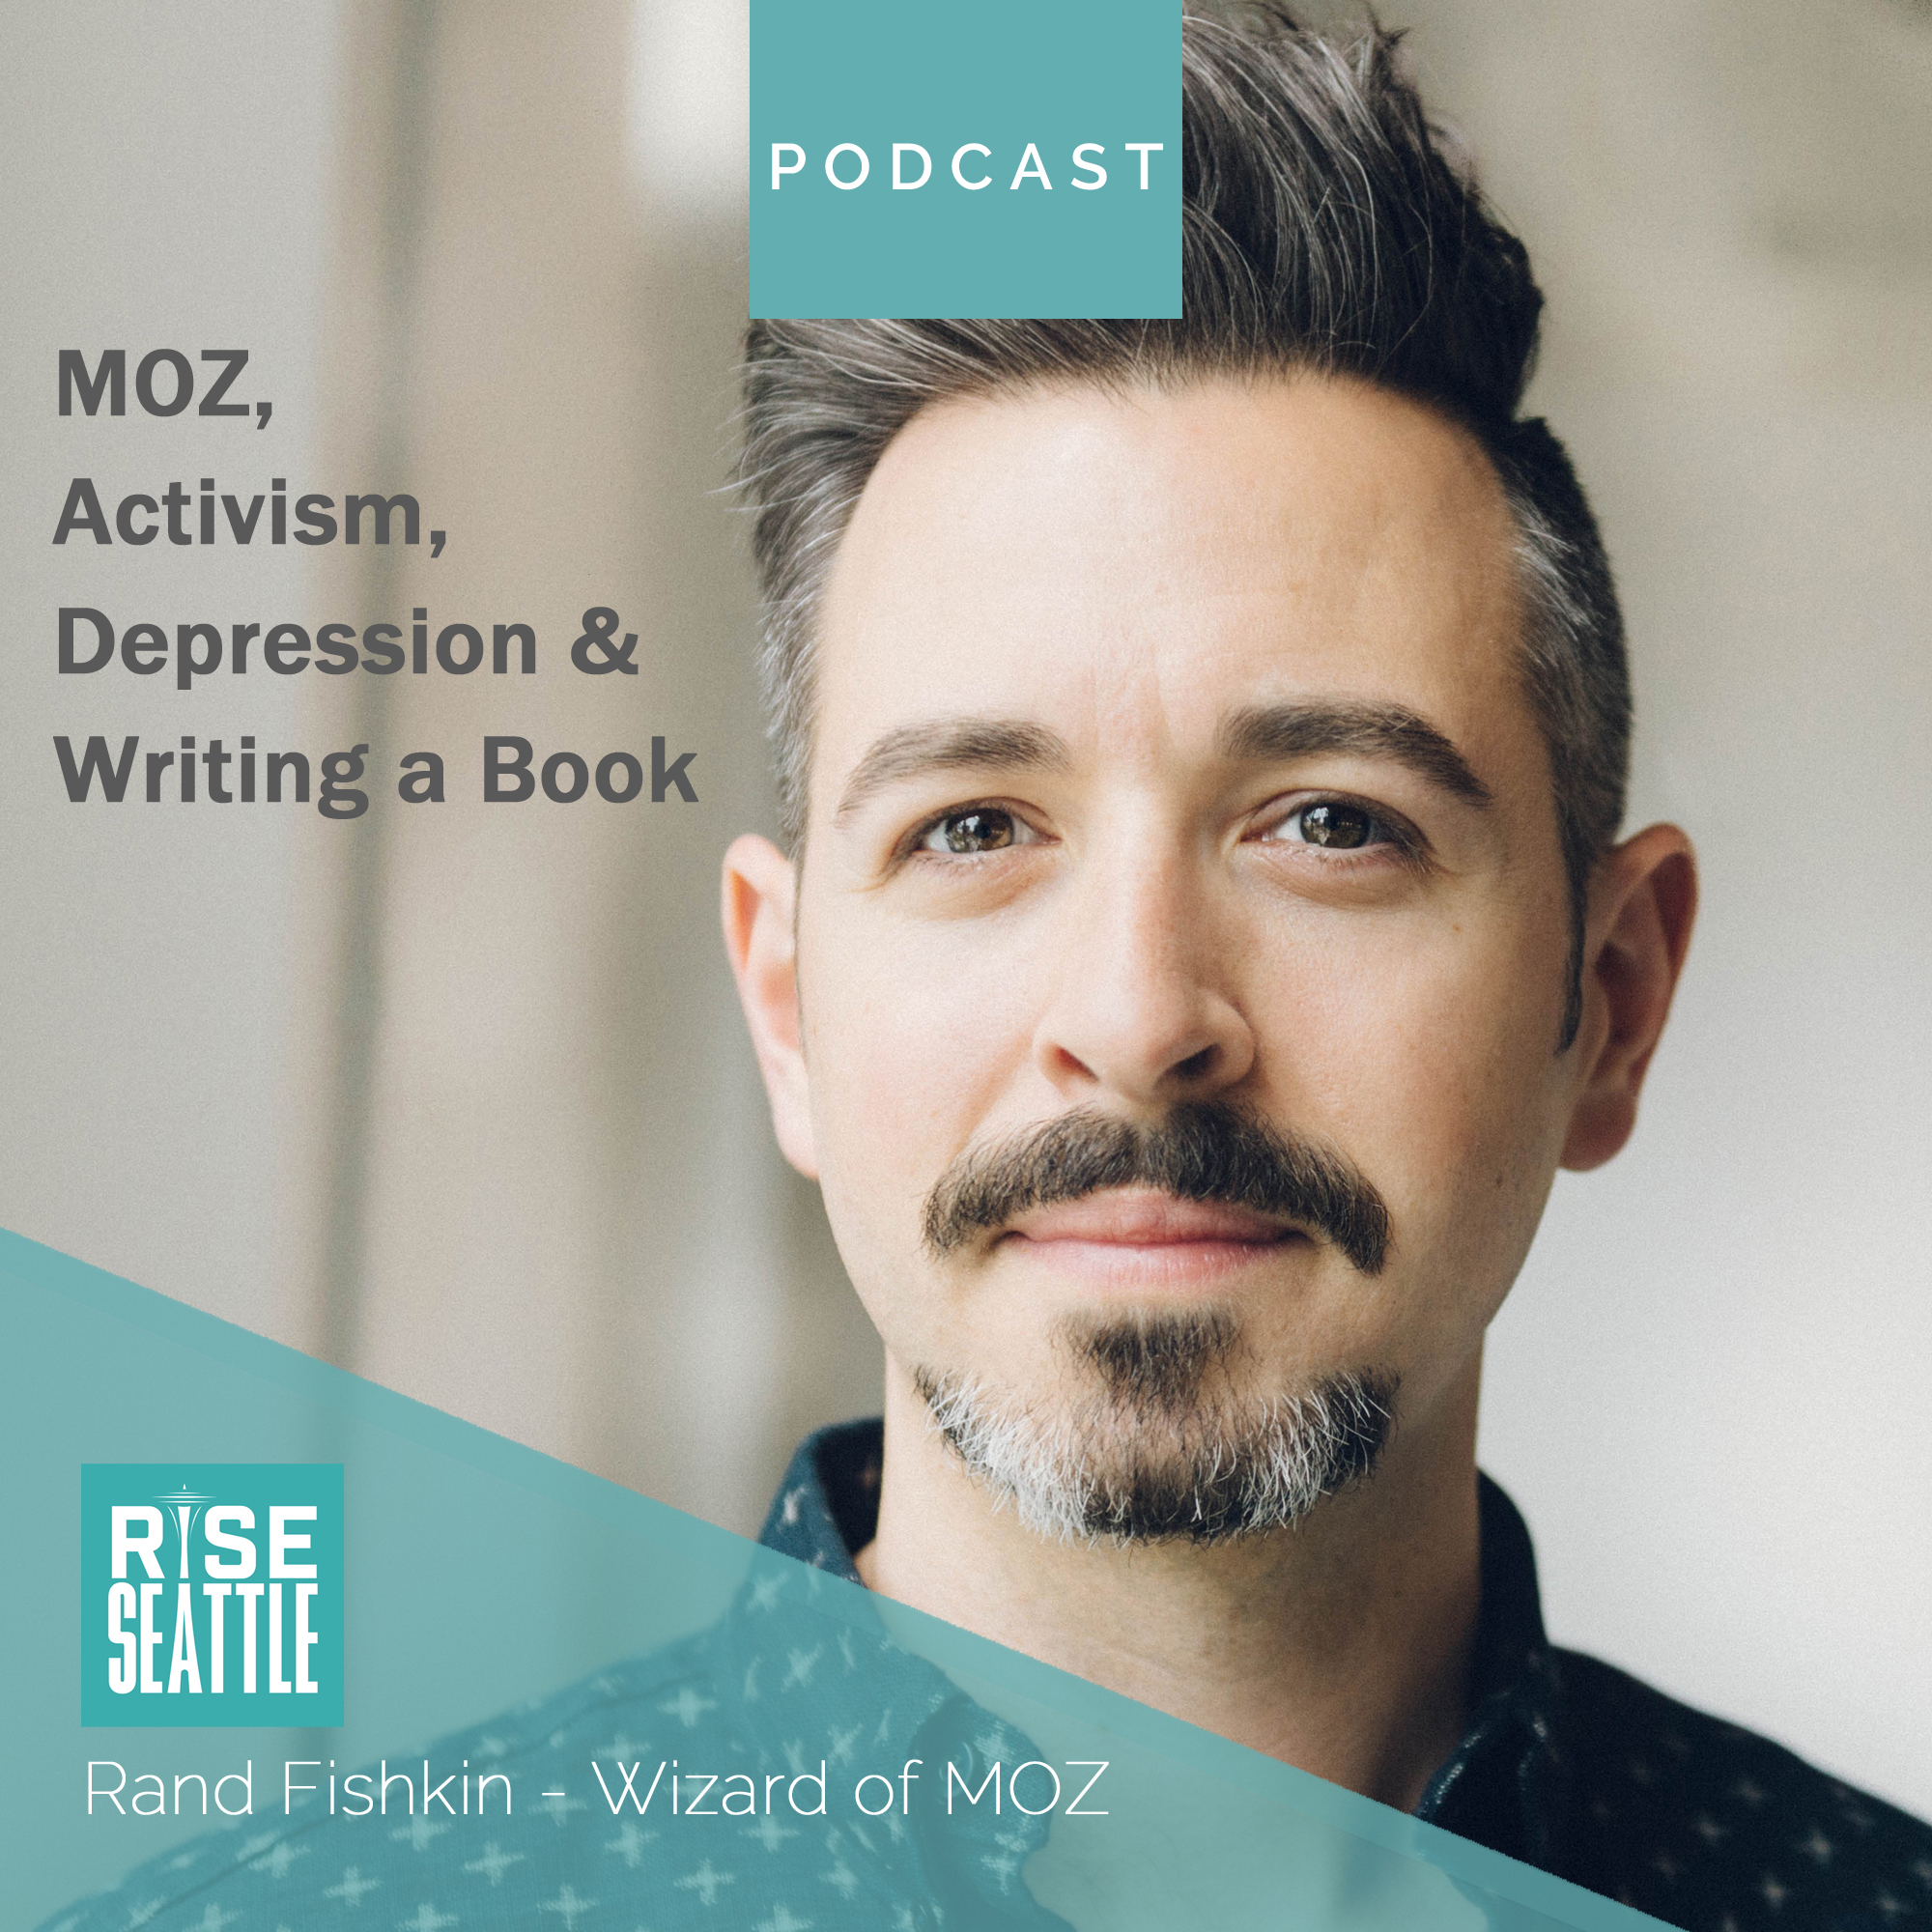 S2 E1: Rand Fishkin: MOZ, Activism, Depression & Writing a Book